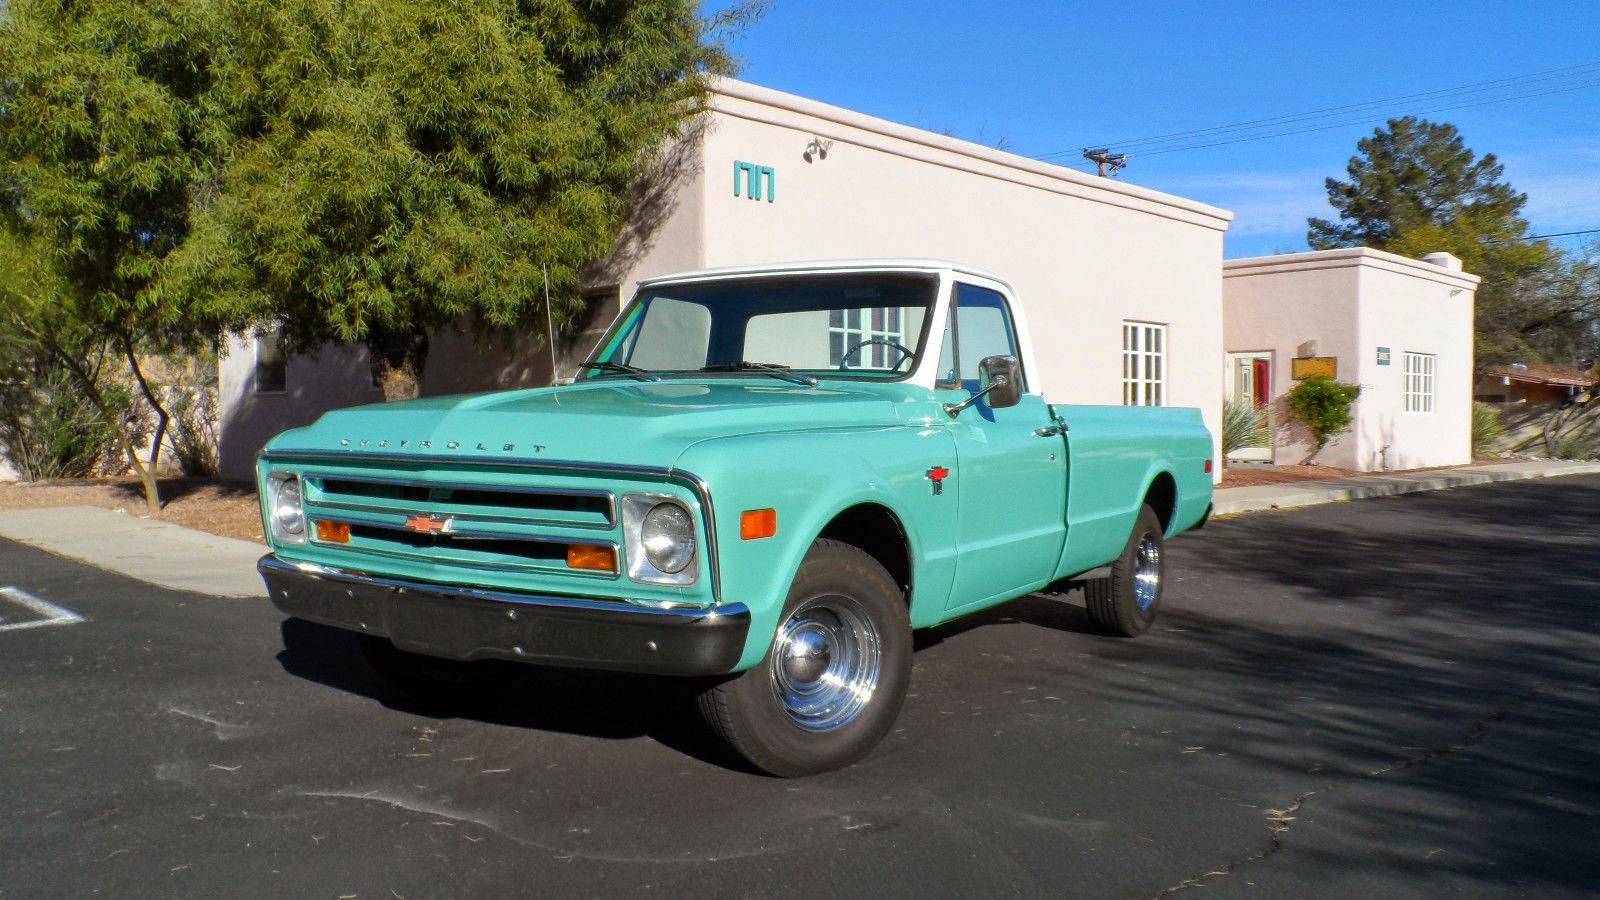 Pickup chevy c10 pickup truck : All American Classic Cars: 1968 Chevrolet C10 Pickup Truck